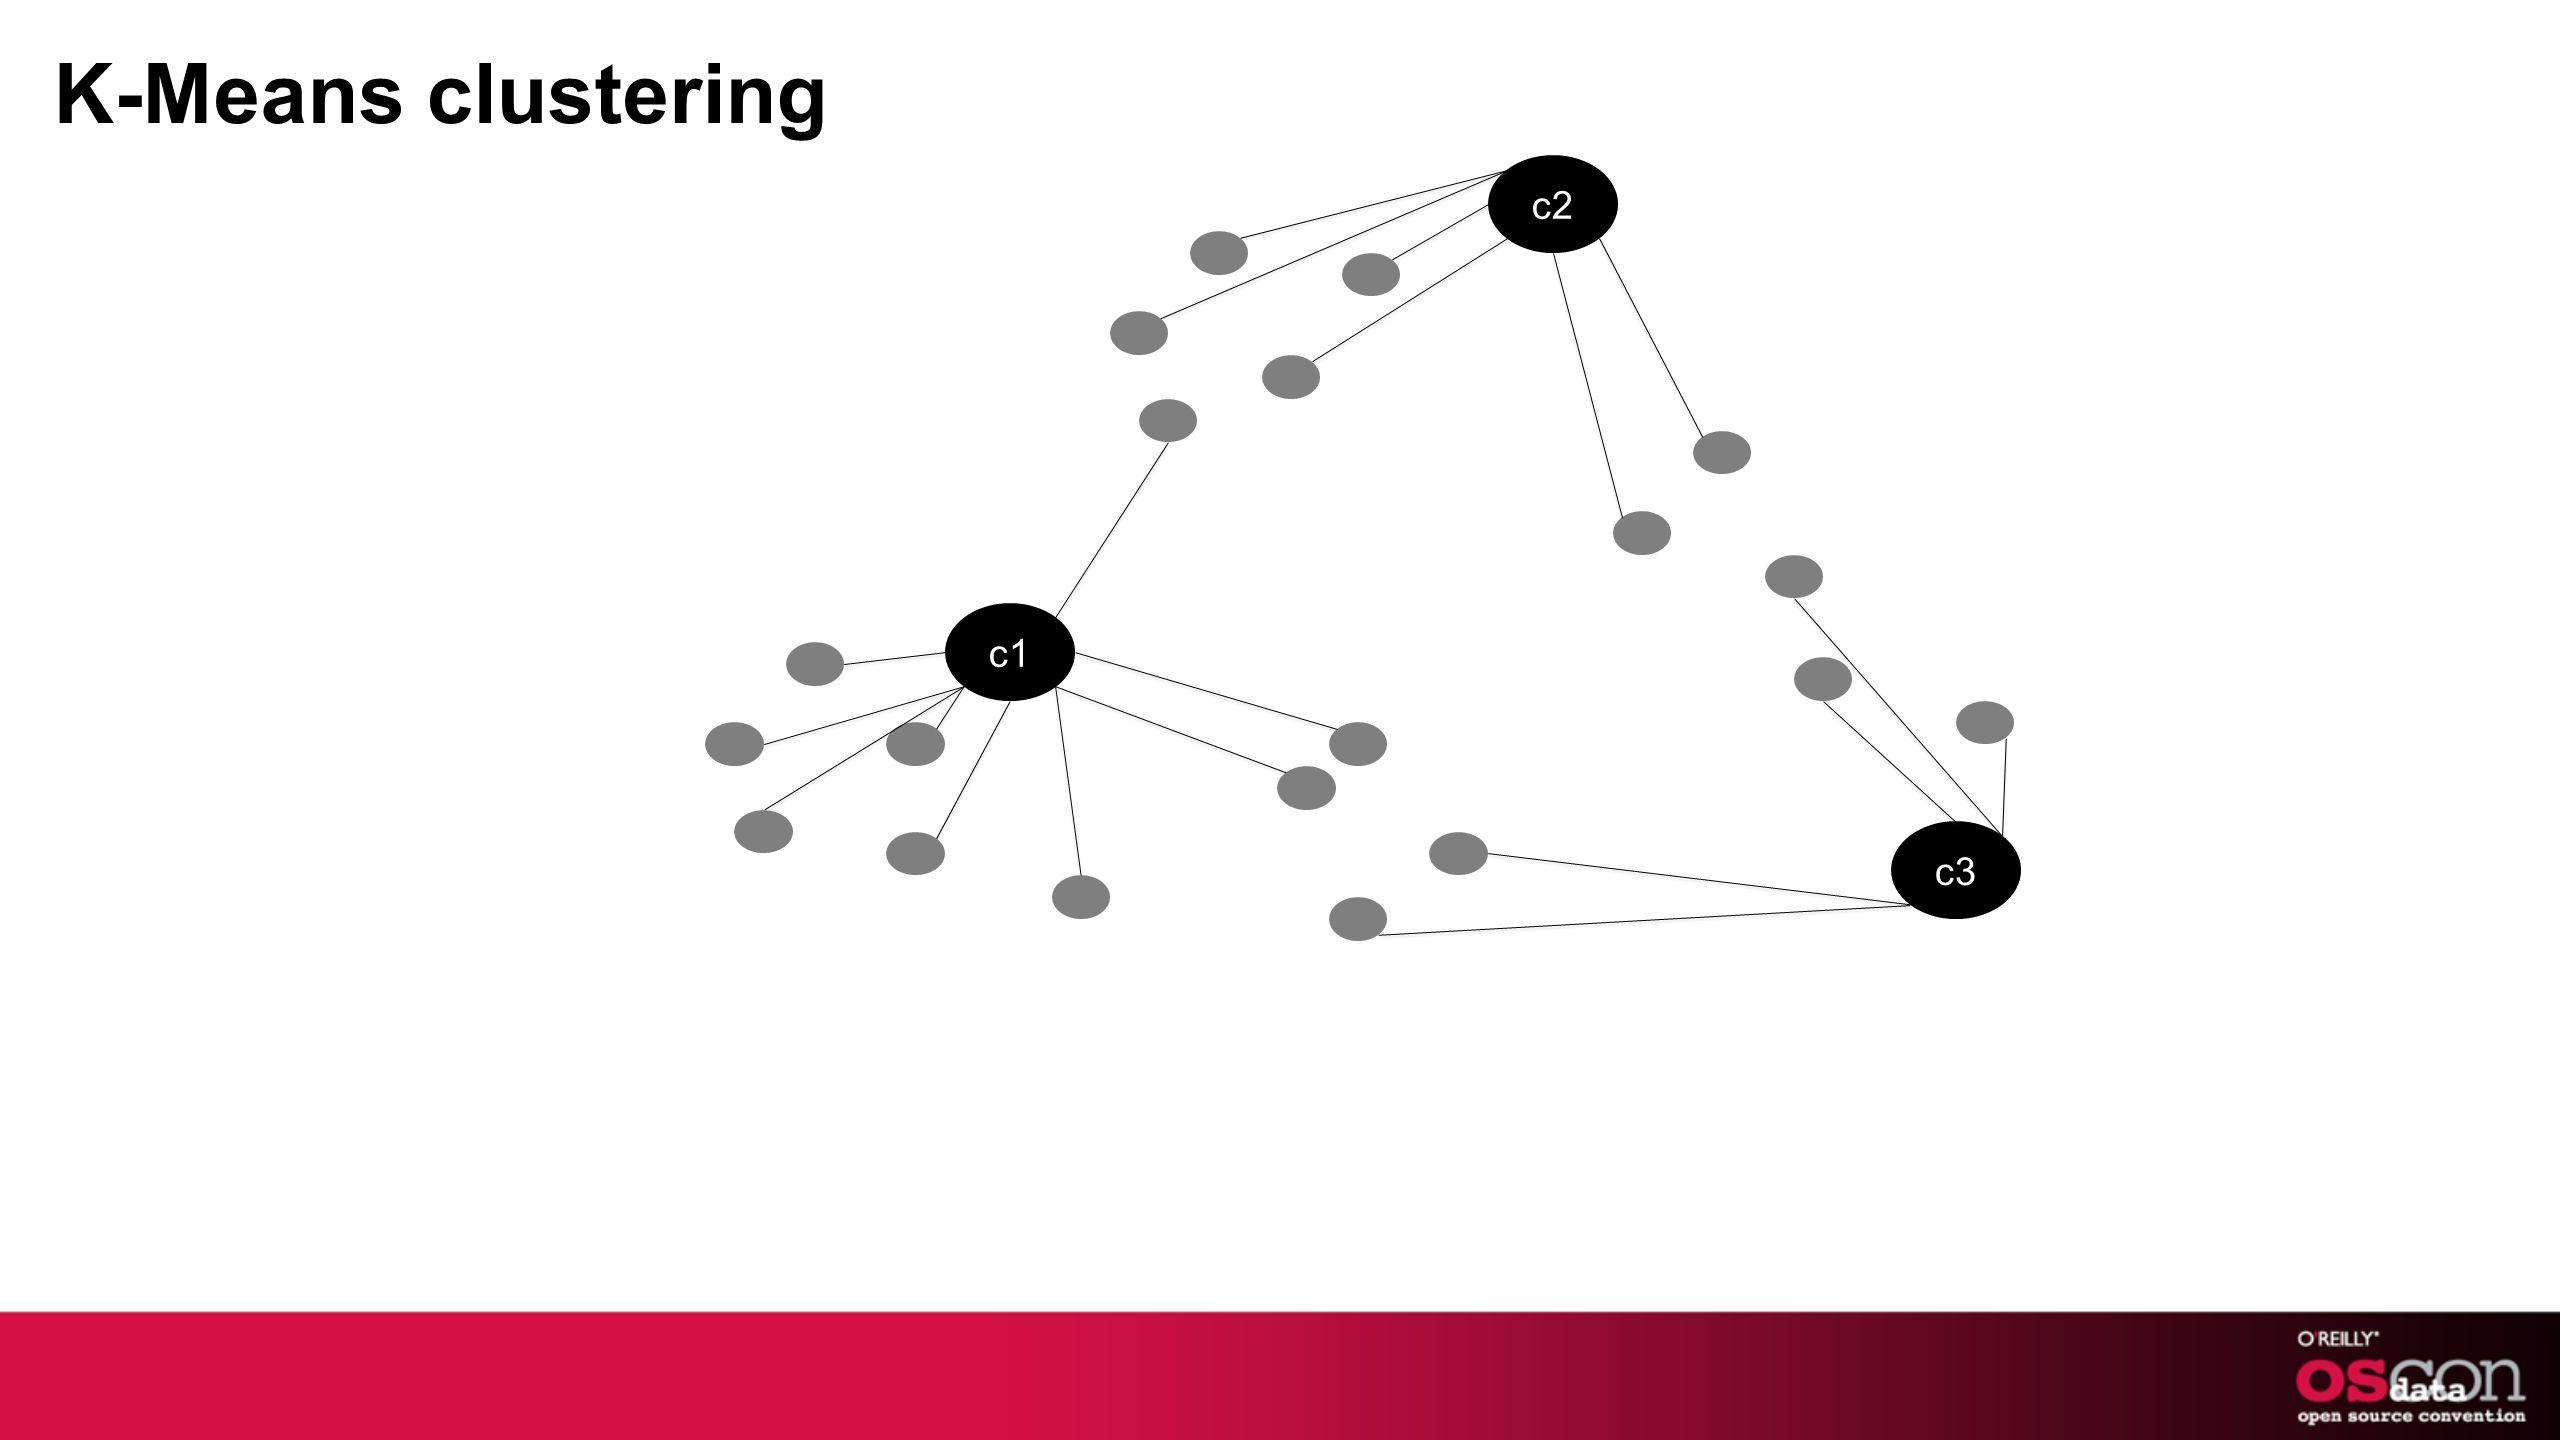 c1 c2 c3 K-Means clustering